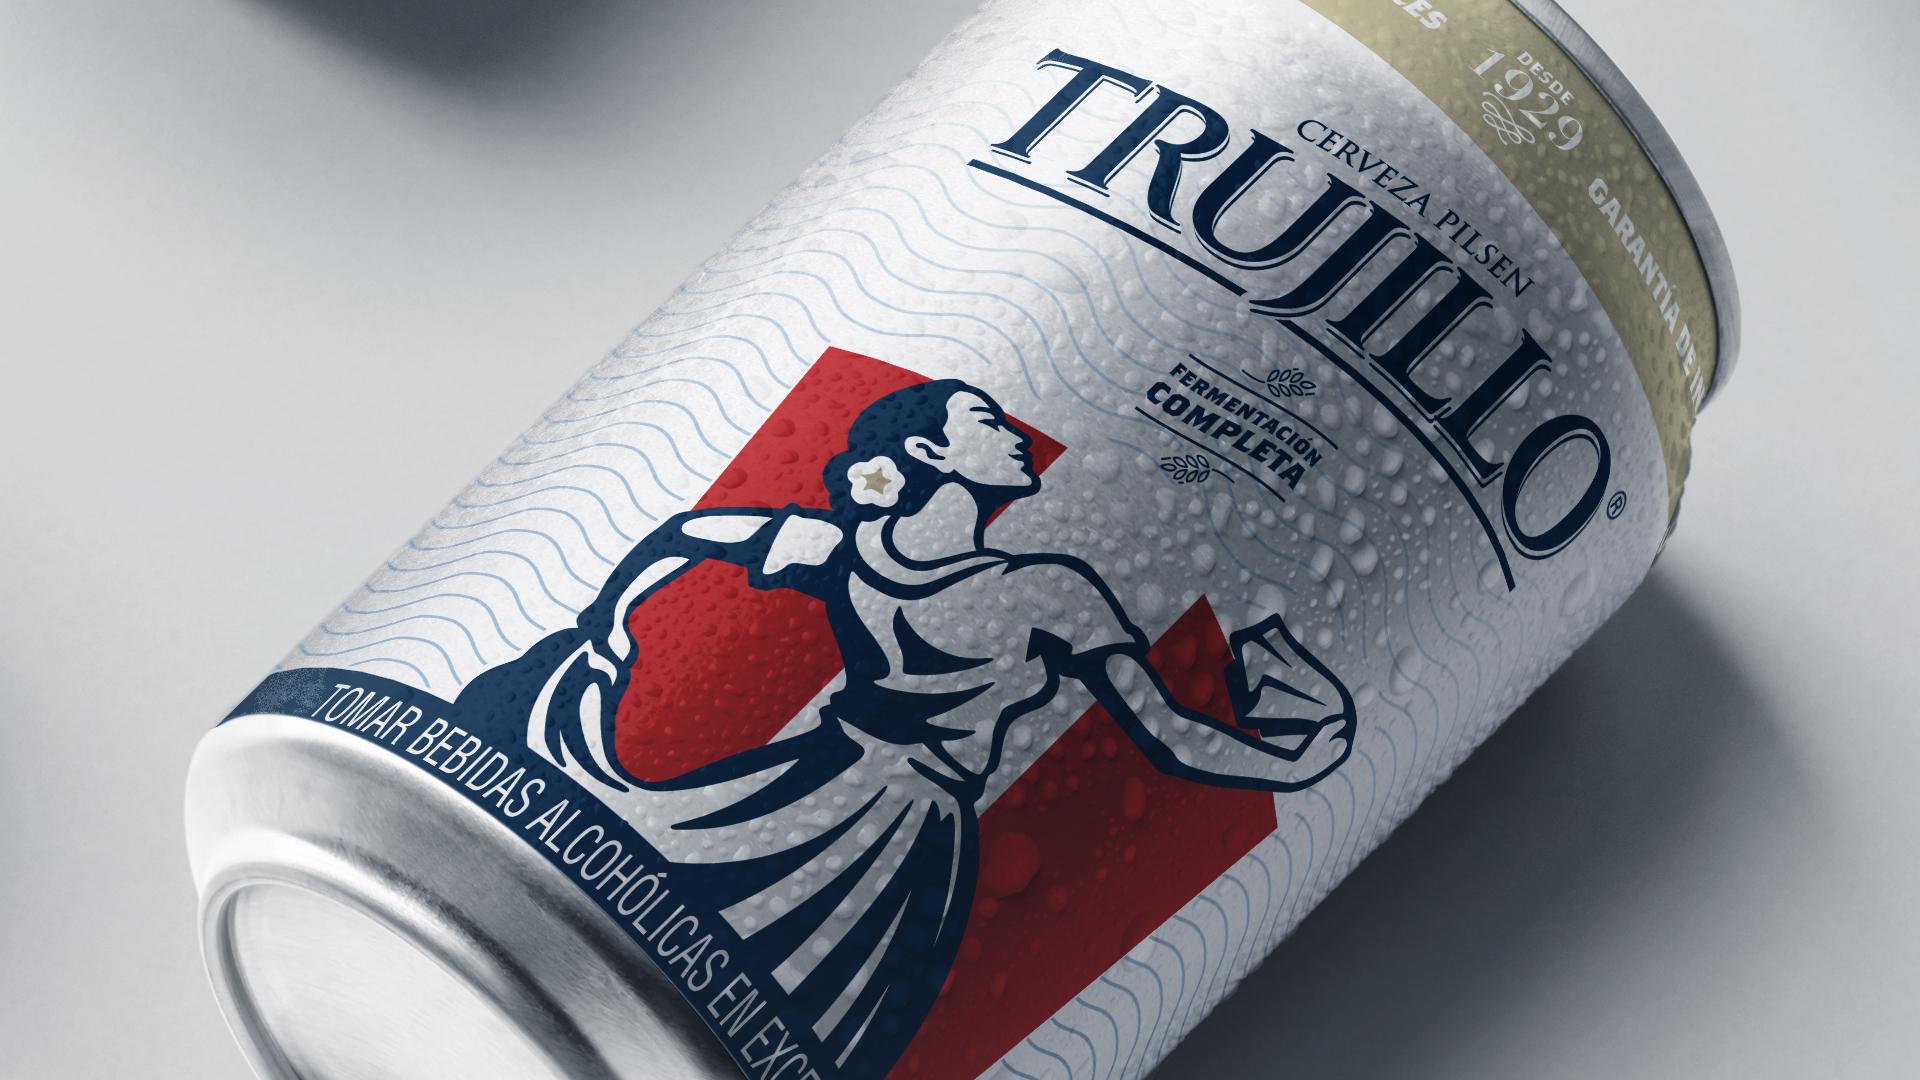 Peruvian Pilsen Trujillo Beer Concept Design